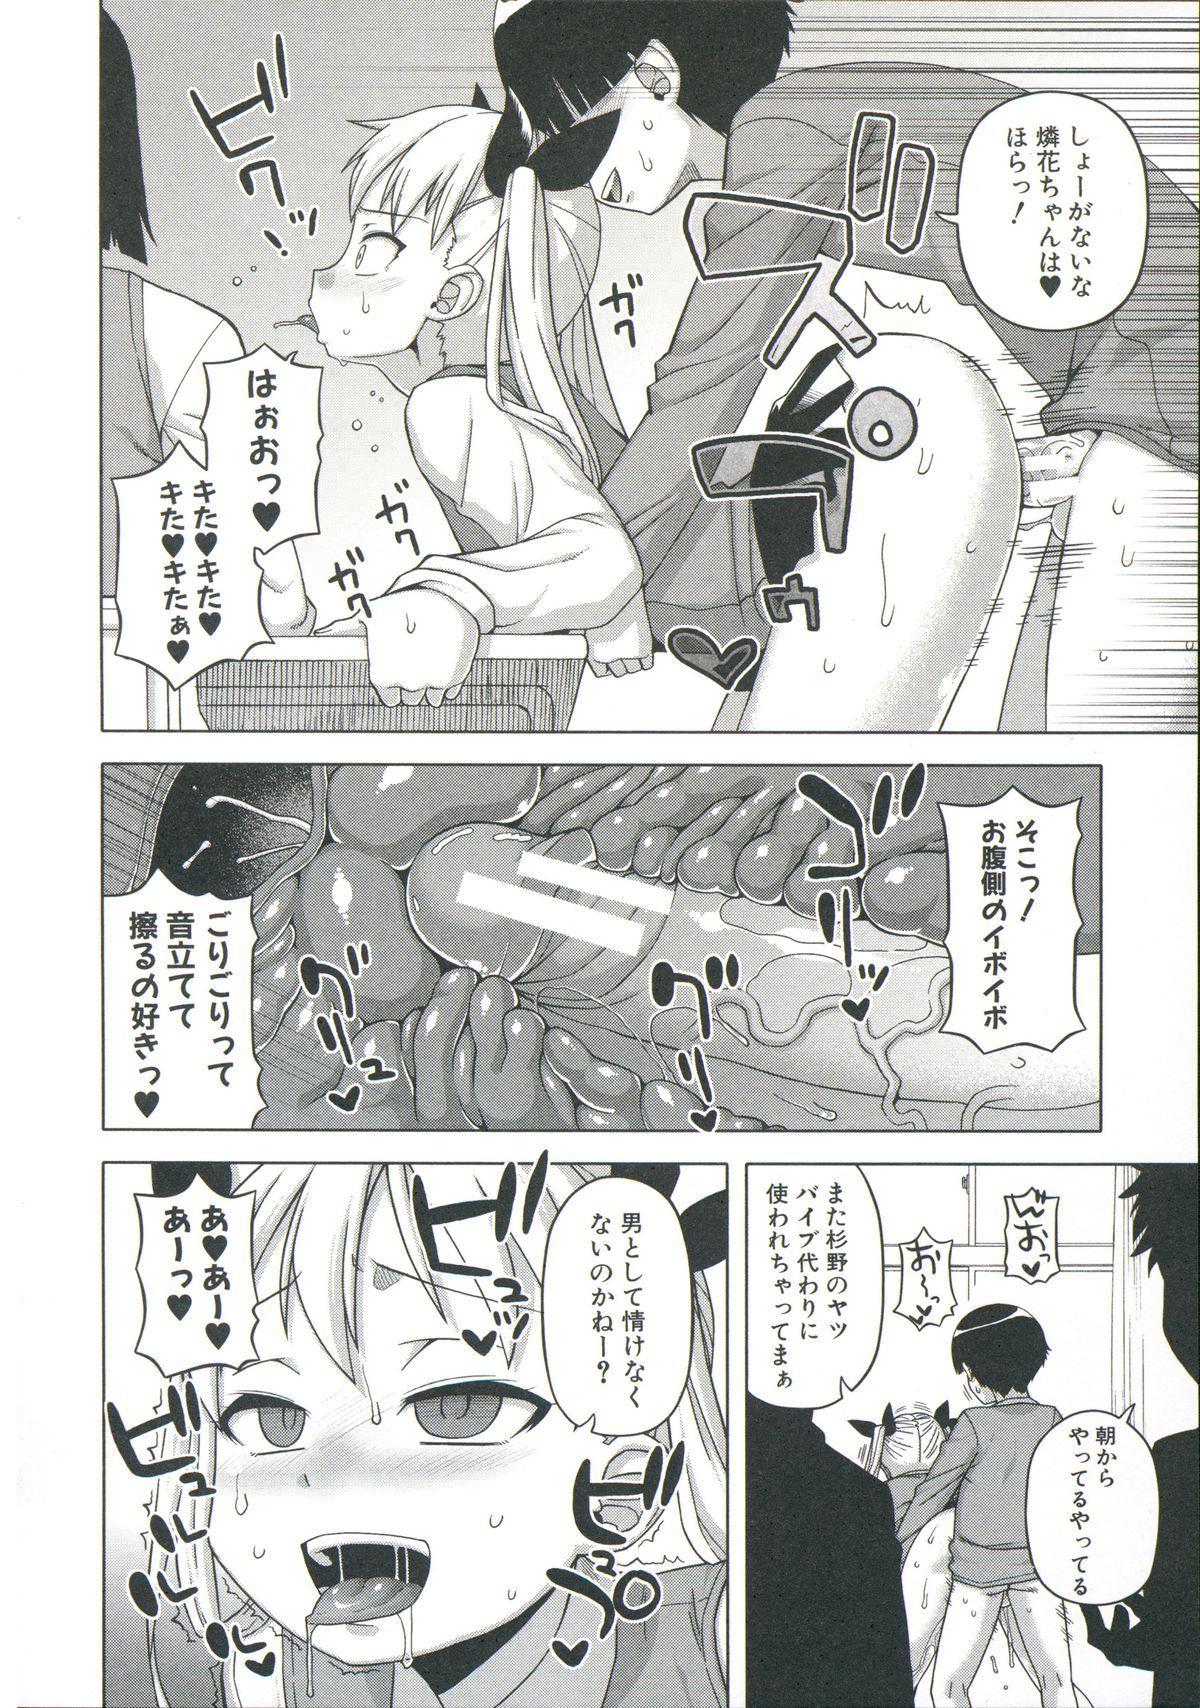 [Takatsu] Ou-sama Appli - King App 146